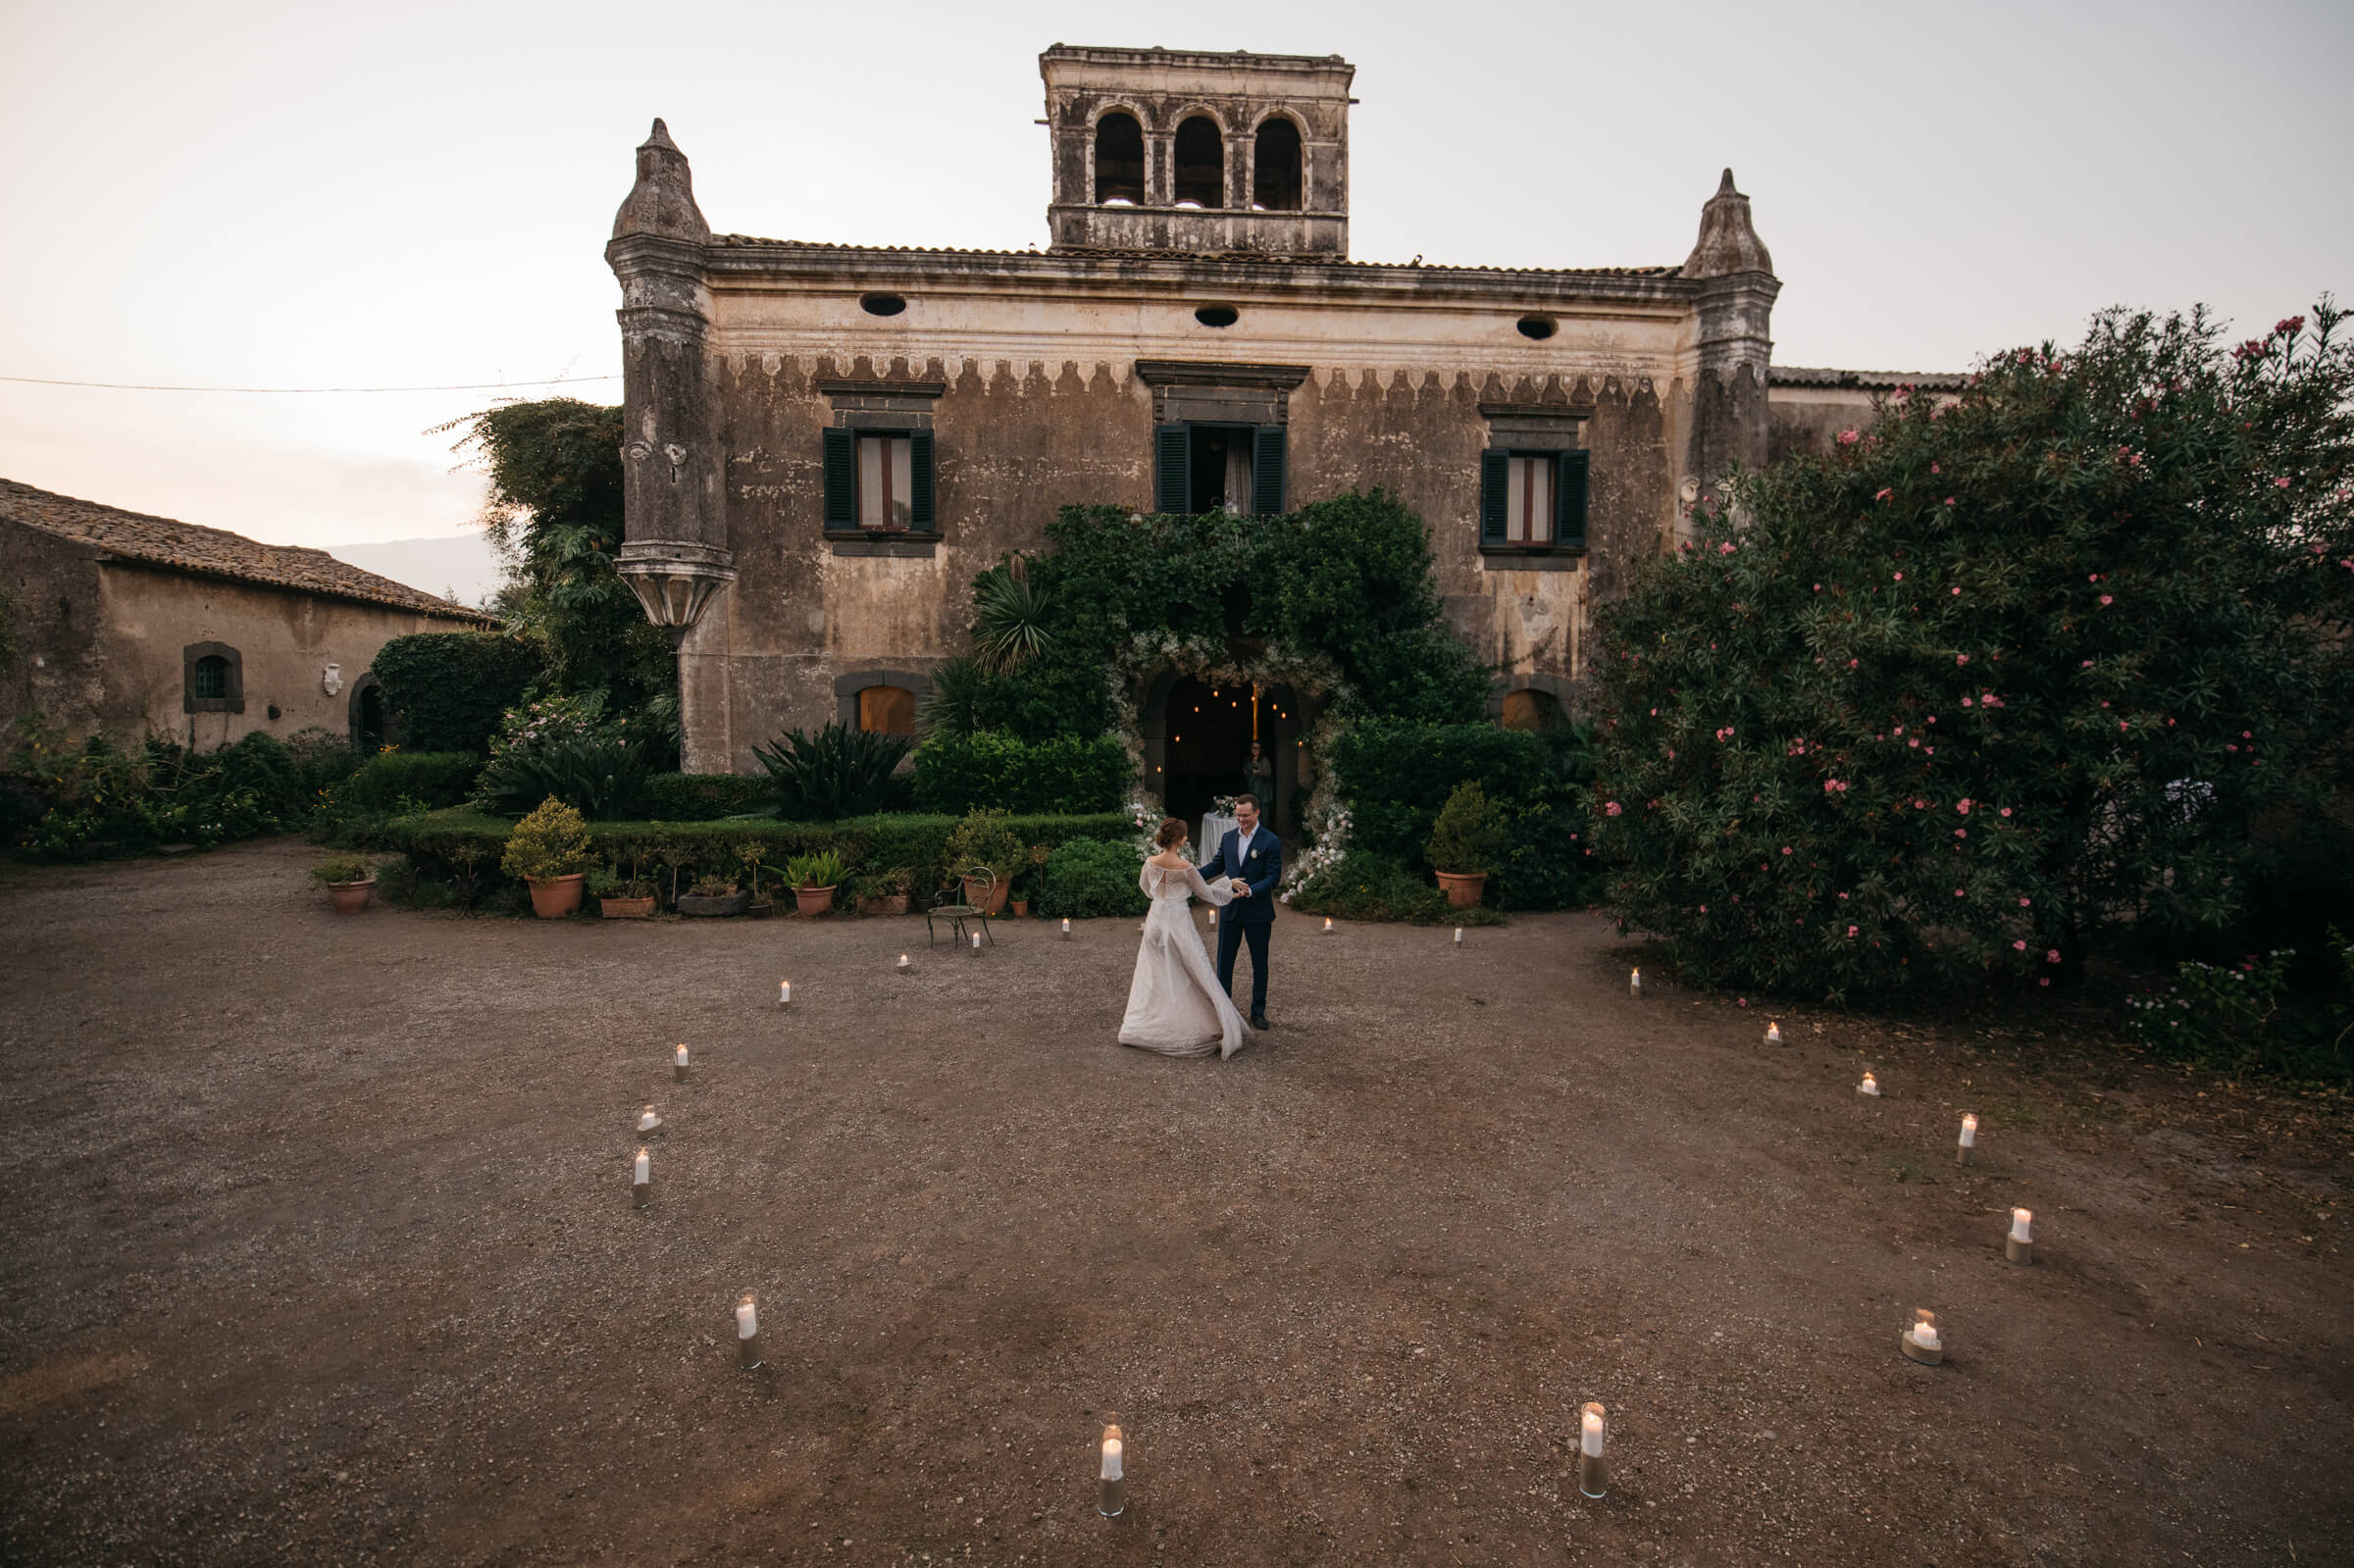 Castello degli Schiavi wedding